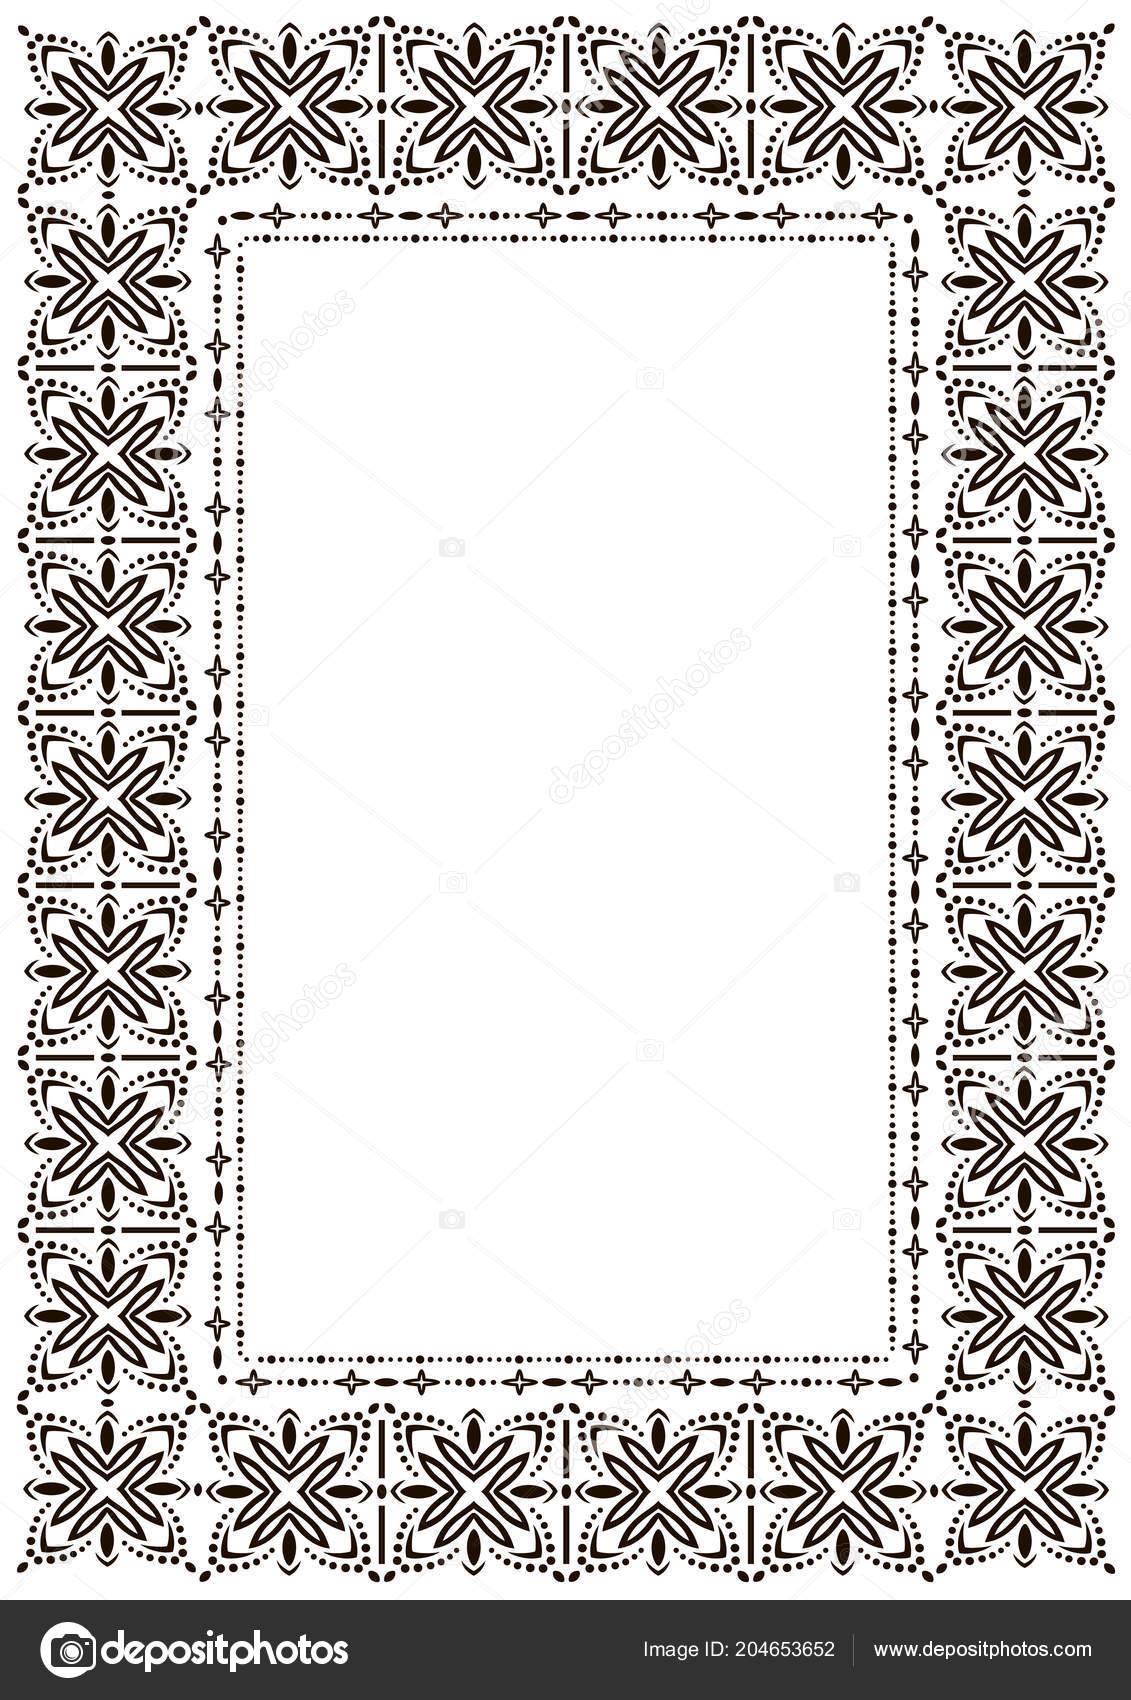 Frame border design template black white decorative vector border black and white decorative vector border on white blank background for certificate invitation document menu etc vetor por shiny777 stopboris Choice Image